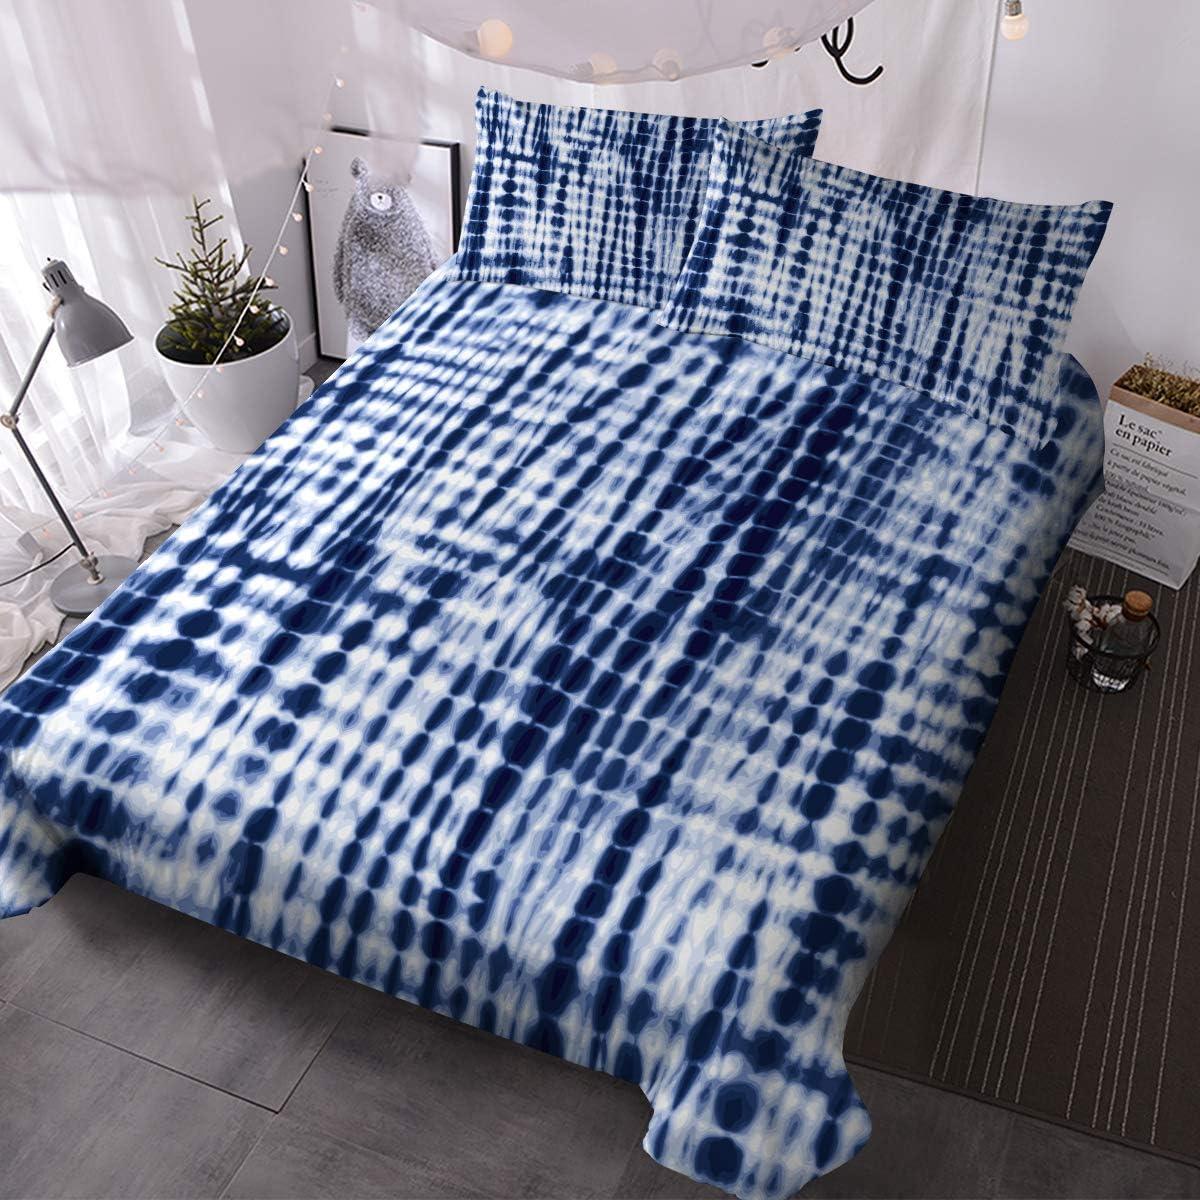 Blessliving 3 Piece Blue Tie Dye Cheap bargain Bedding Bed Topics on TV Ethnic Retro 3D Set